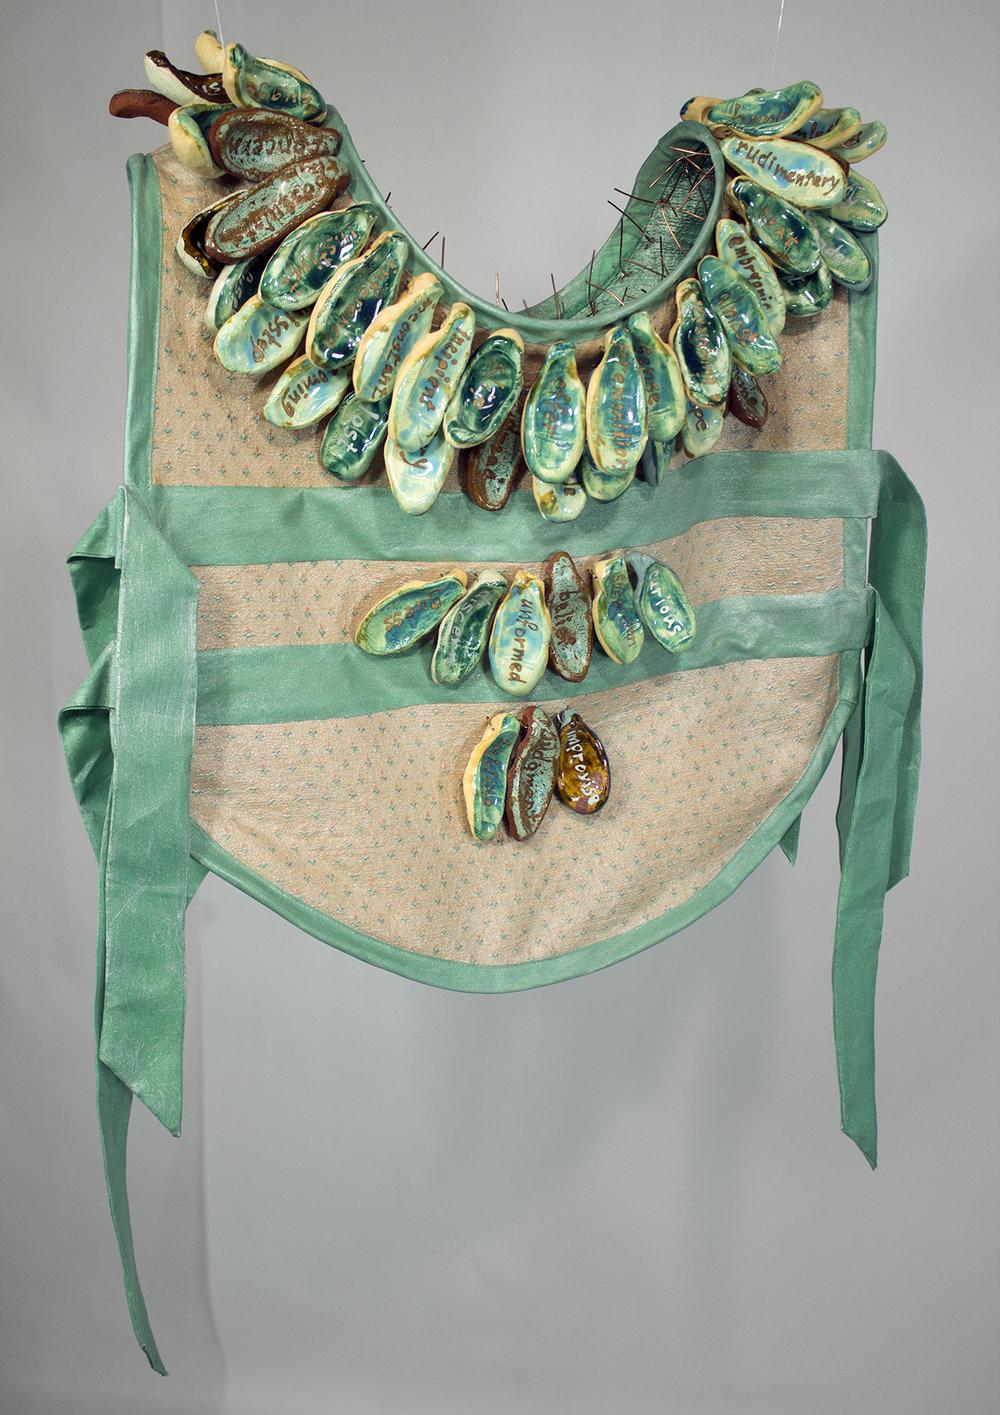 Safety Vest 2 , ceramic, fiber, steel, copper, and acrylic